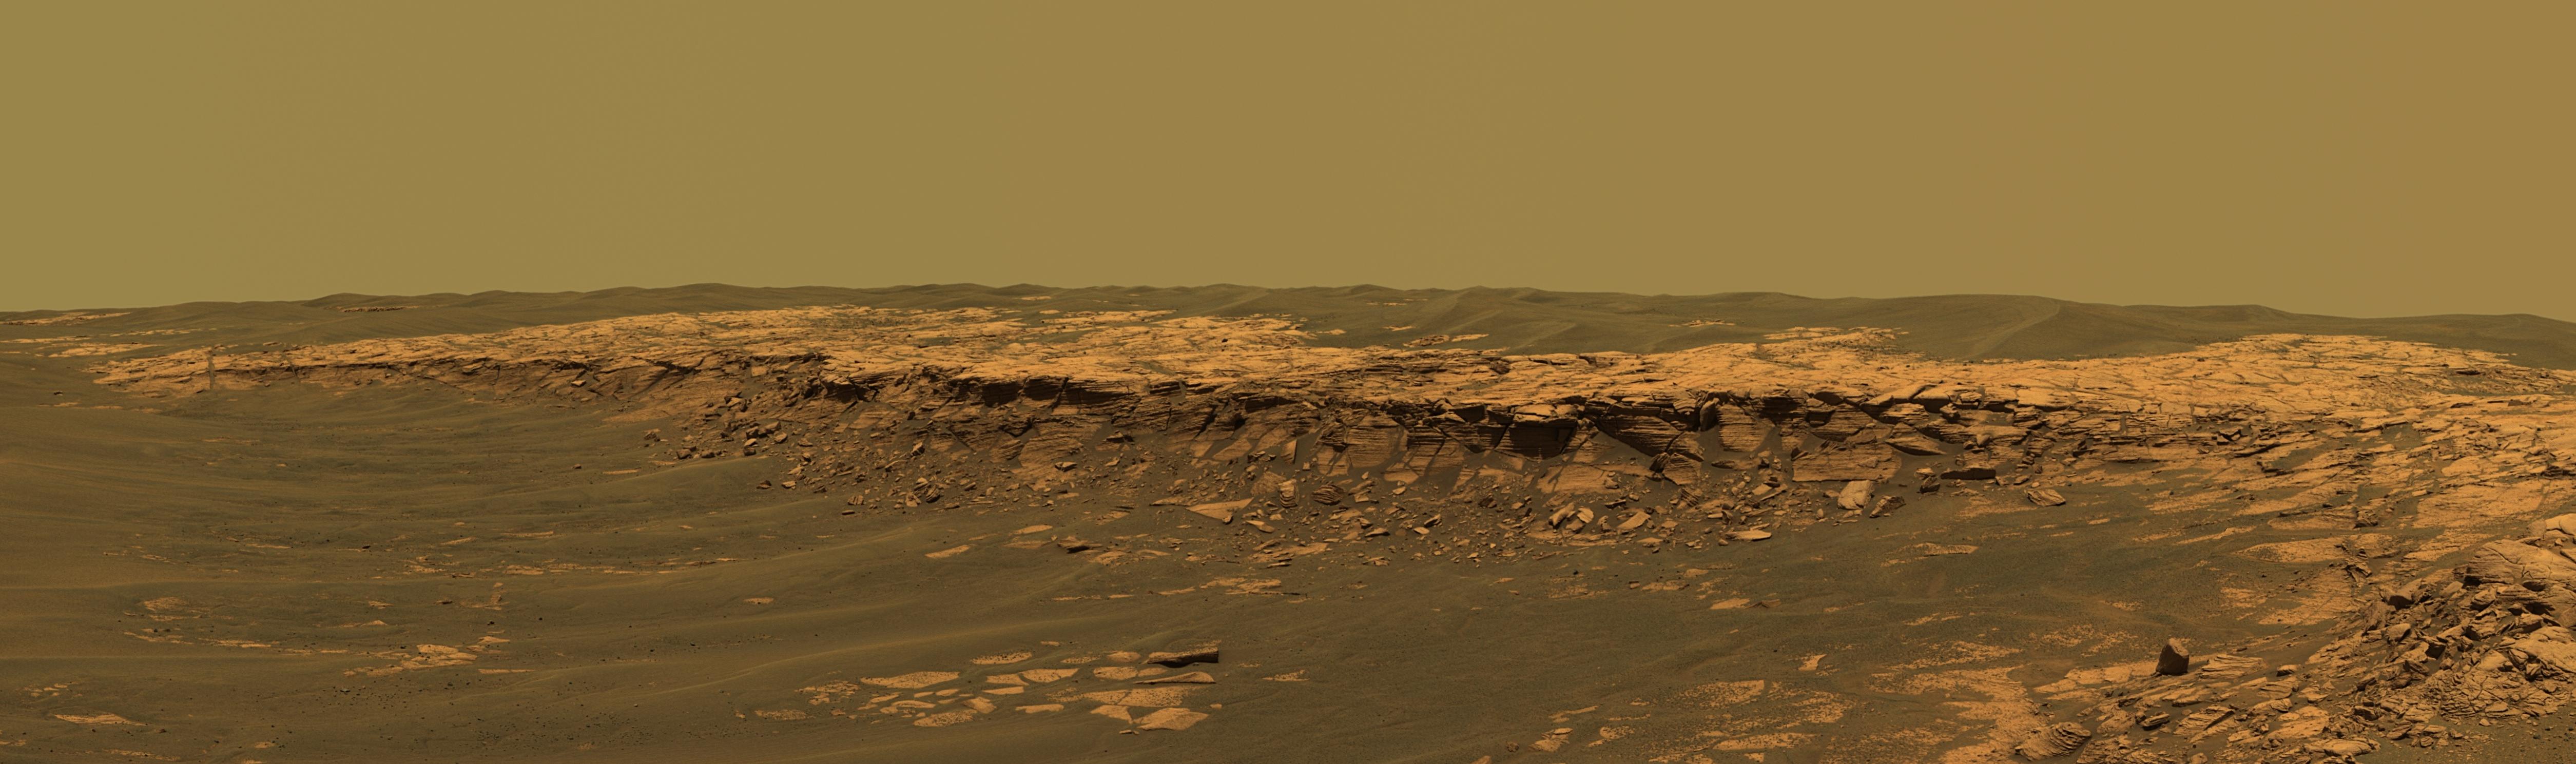 mars surface curiosity panorama - photo #18